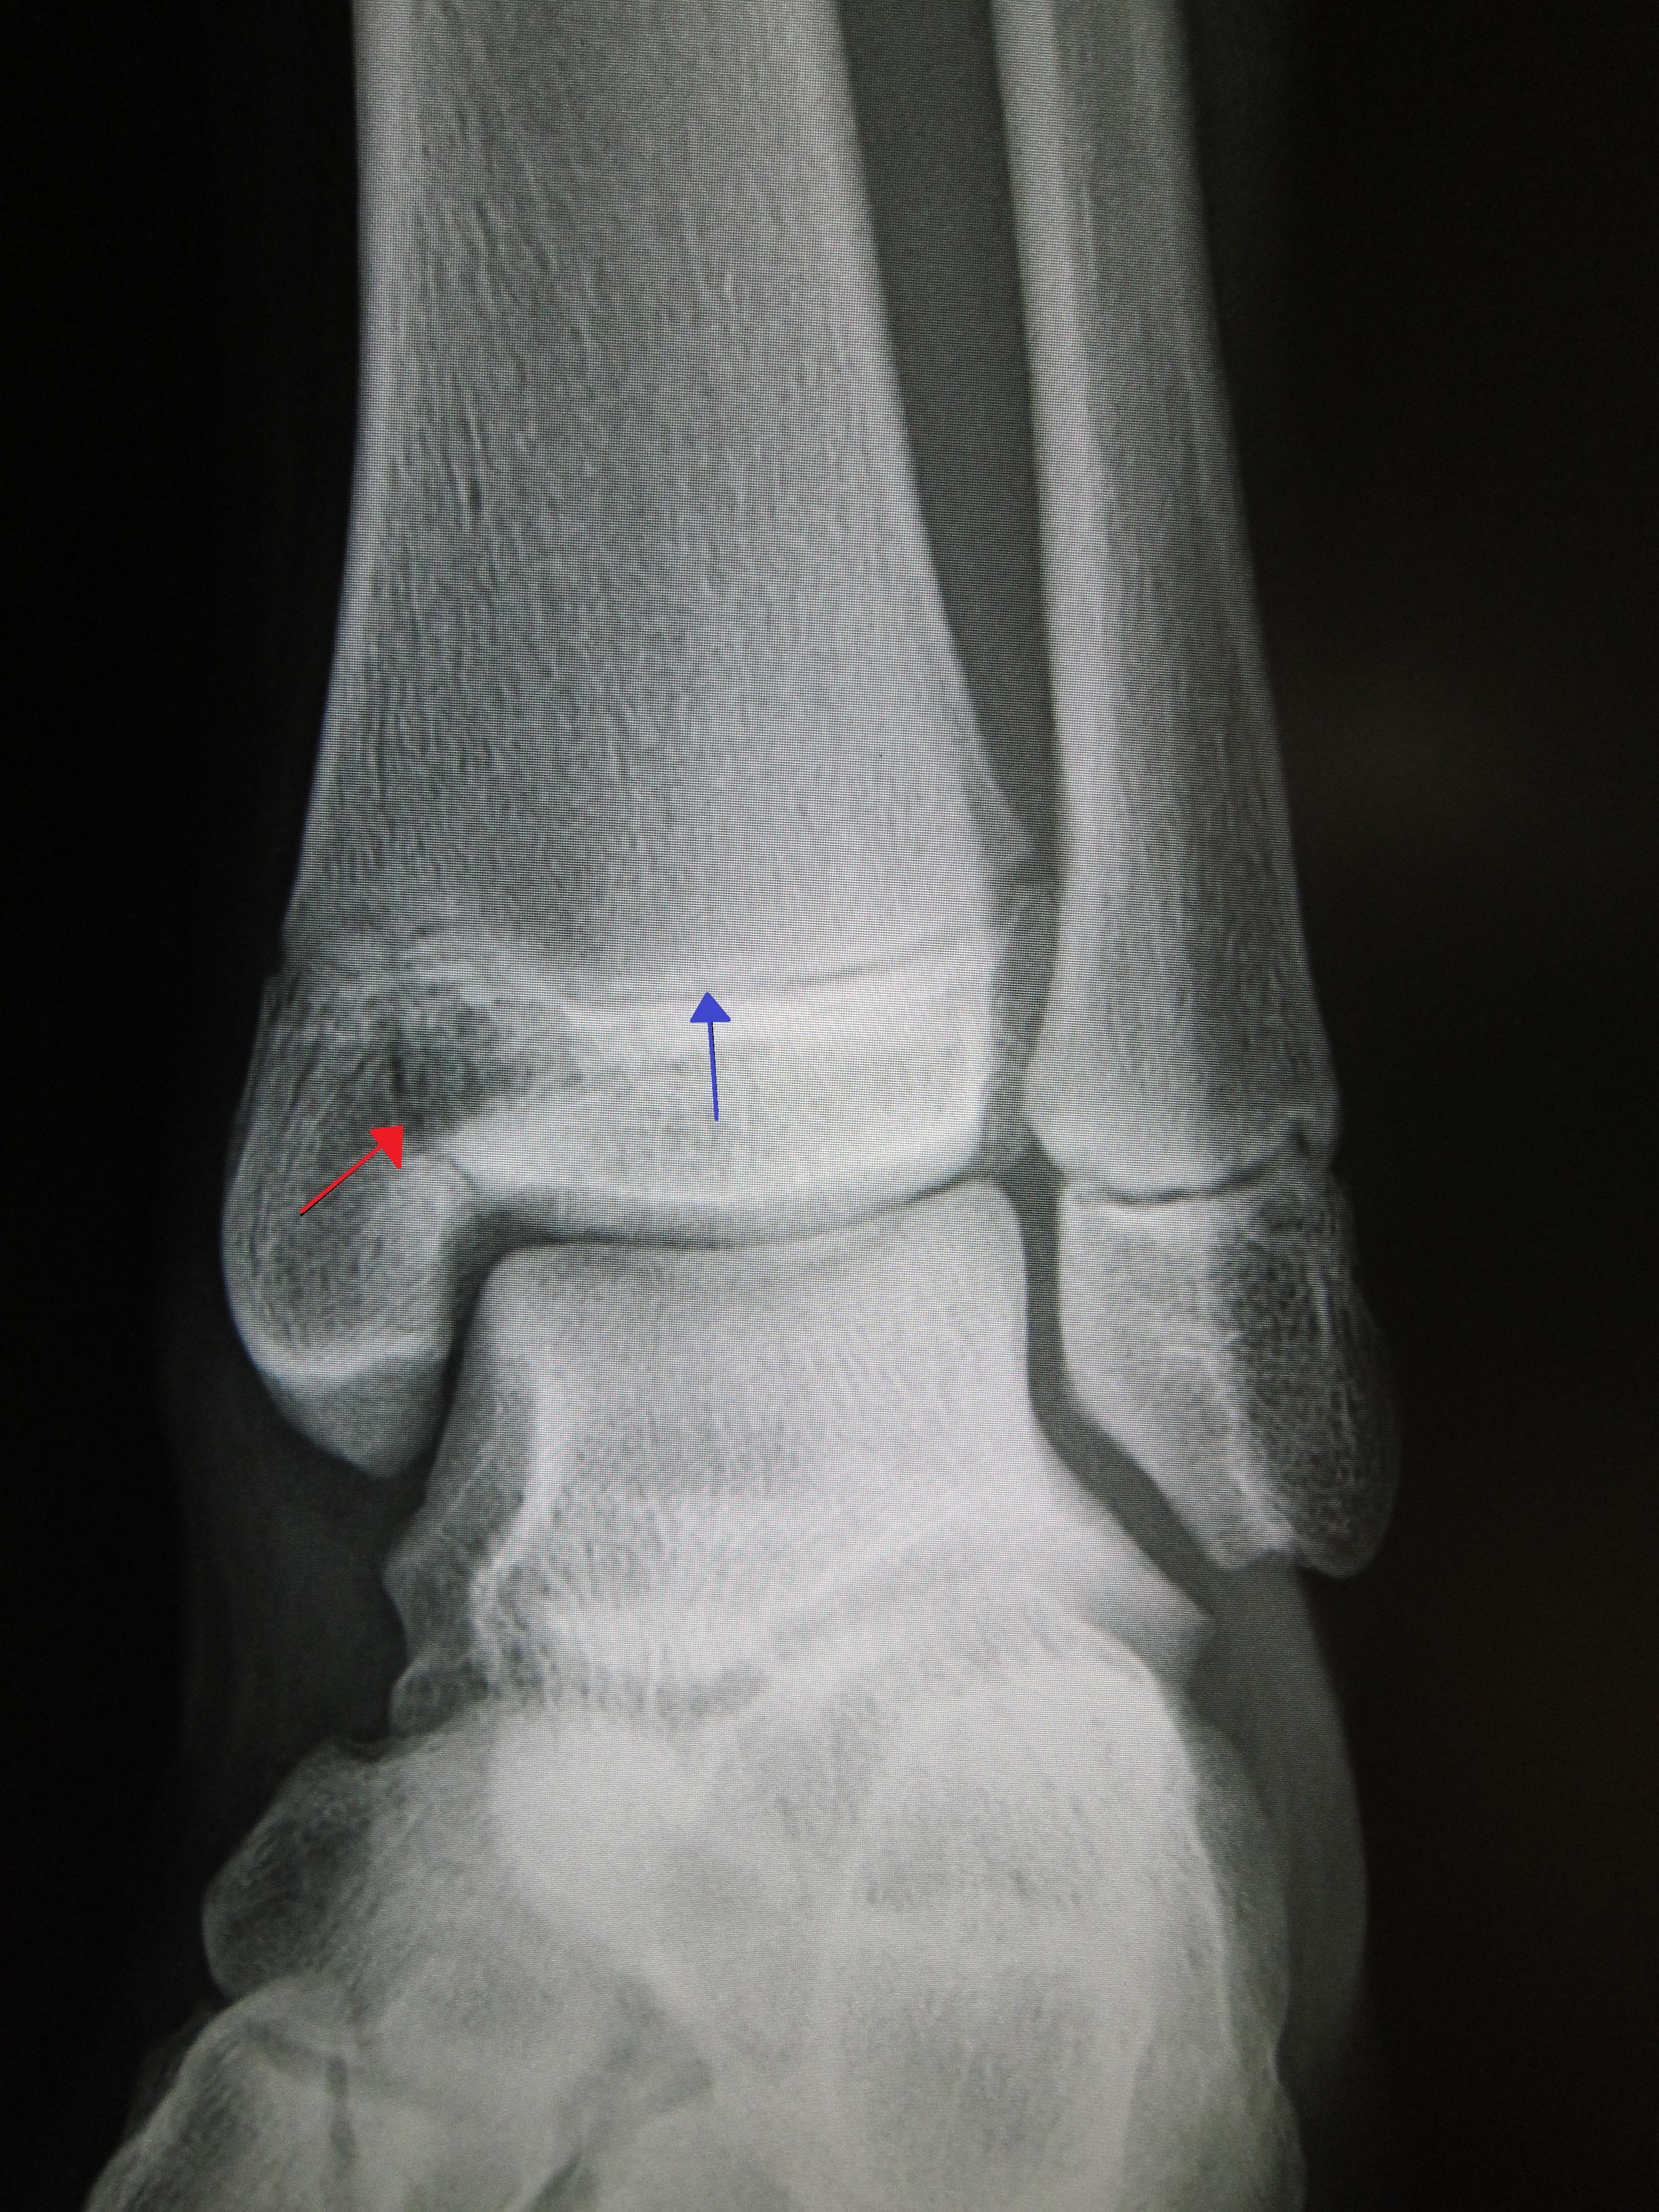 ankle fracture treatment san francisco